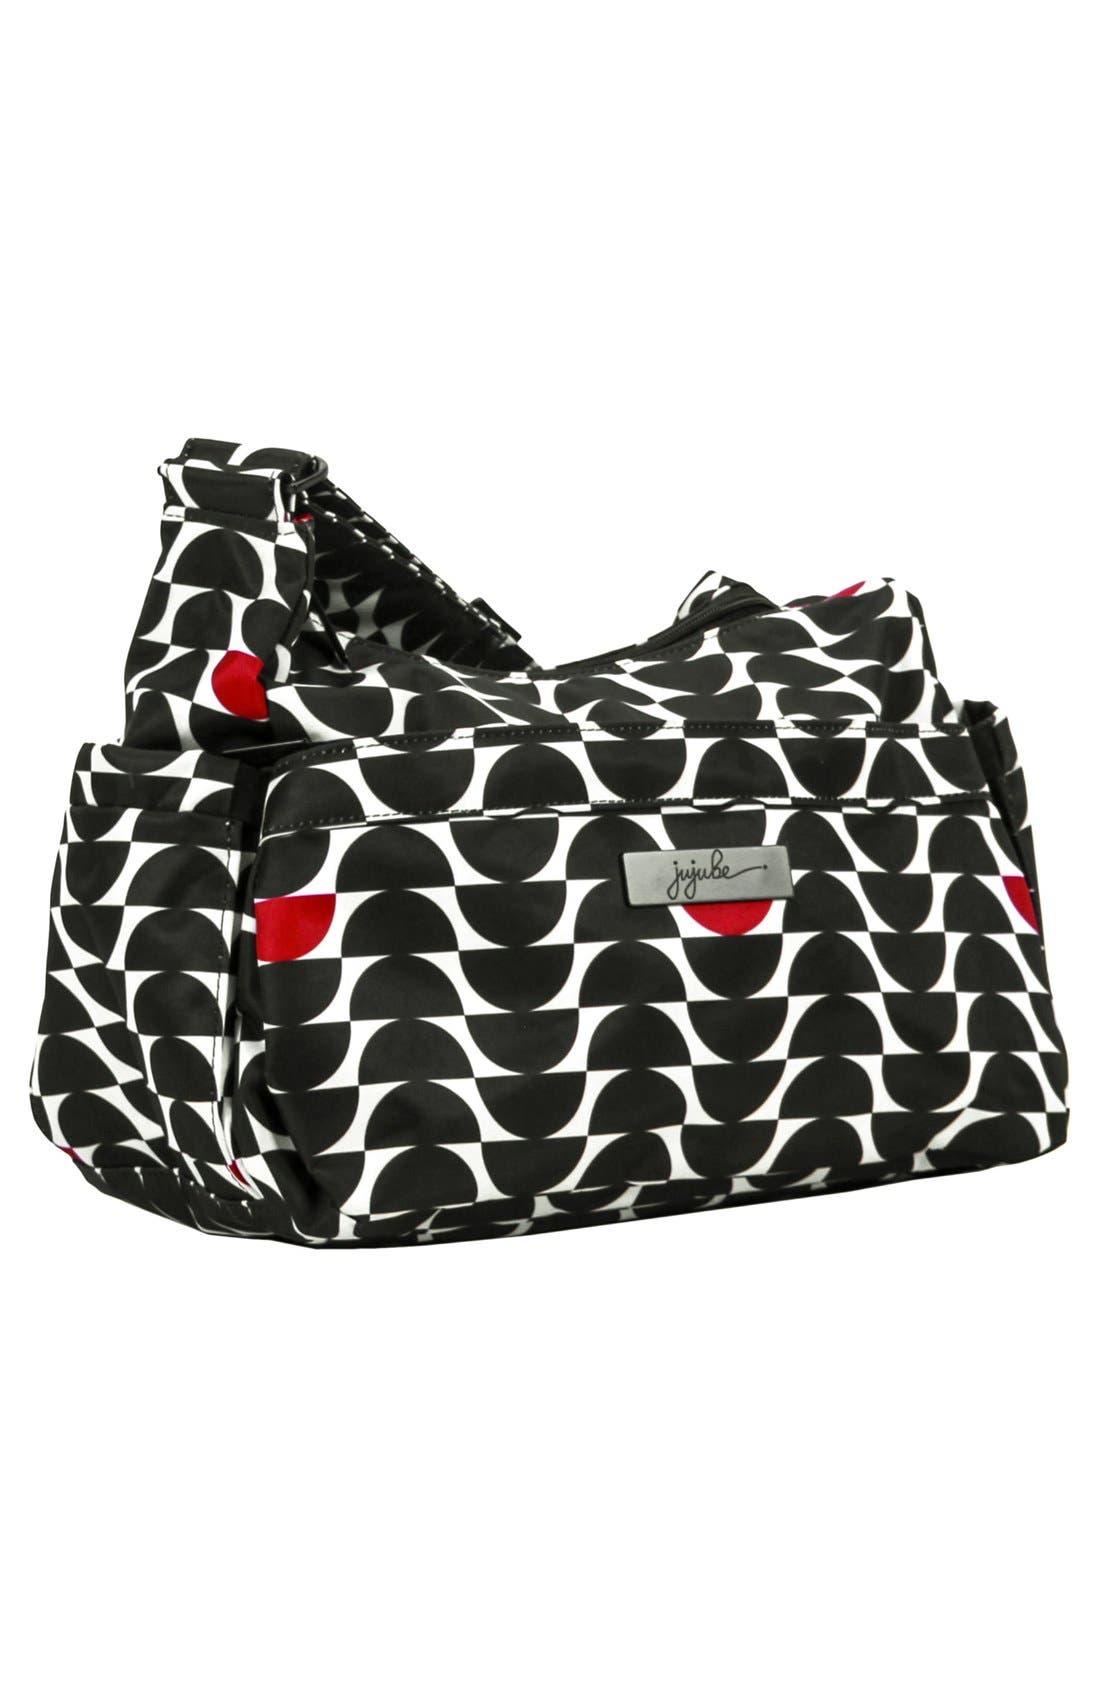 'HoboBe' Diaper Bag,                             Alternate thumbnail 3, color,                             006